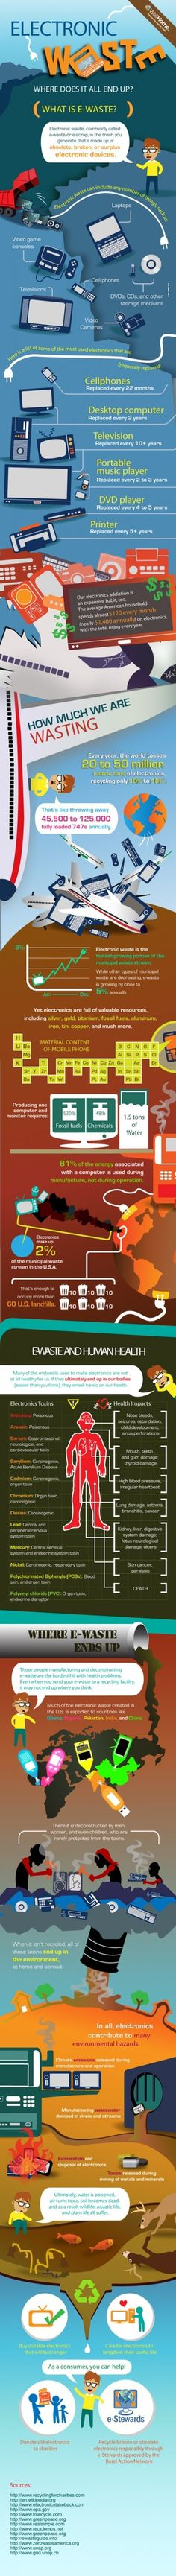 Electronic Waste: Where Does it End Up?   eWasteDirect.com